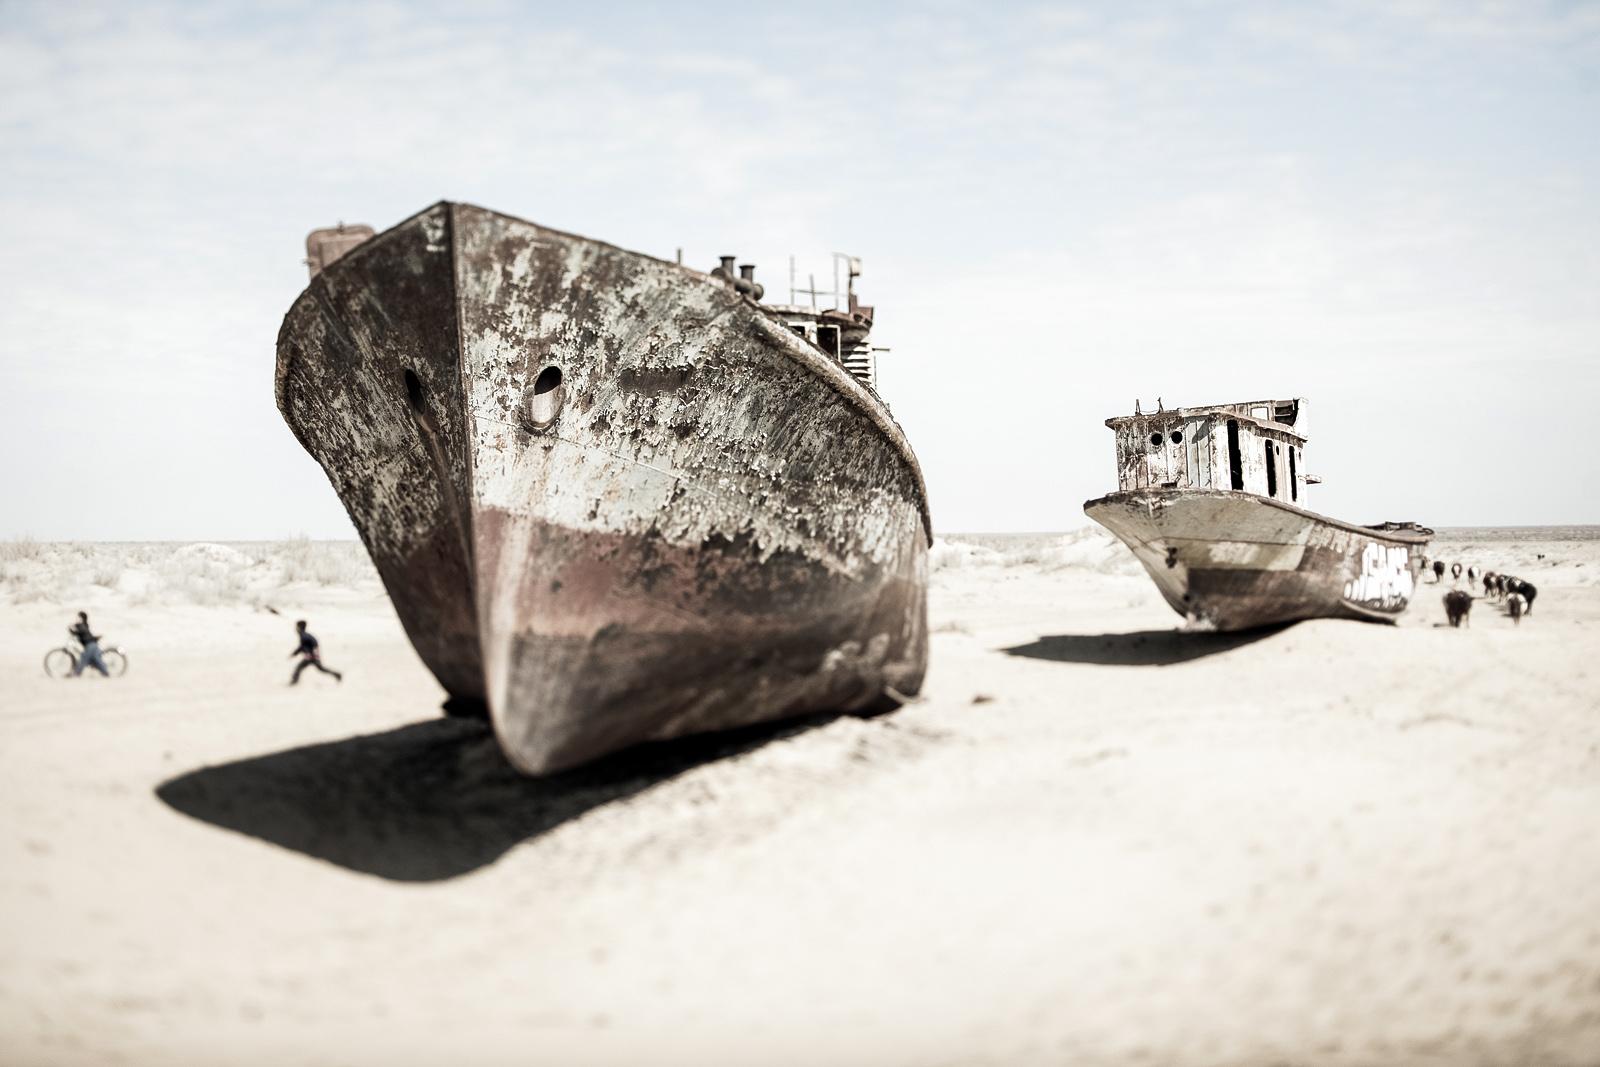 Cementerio de barcos en el Mar de Aral, Uzbekistán.